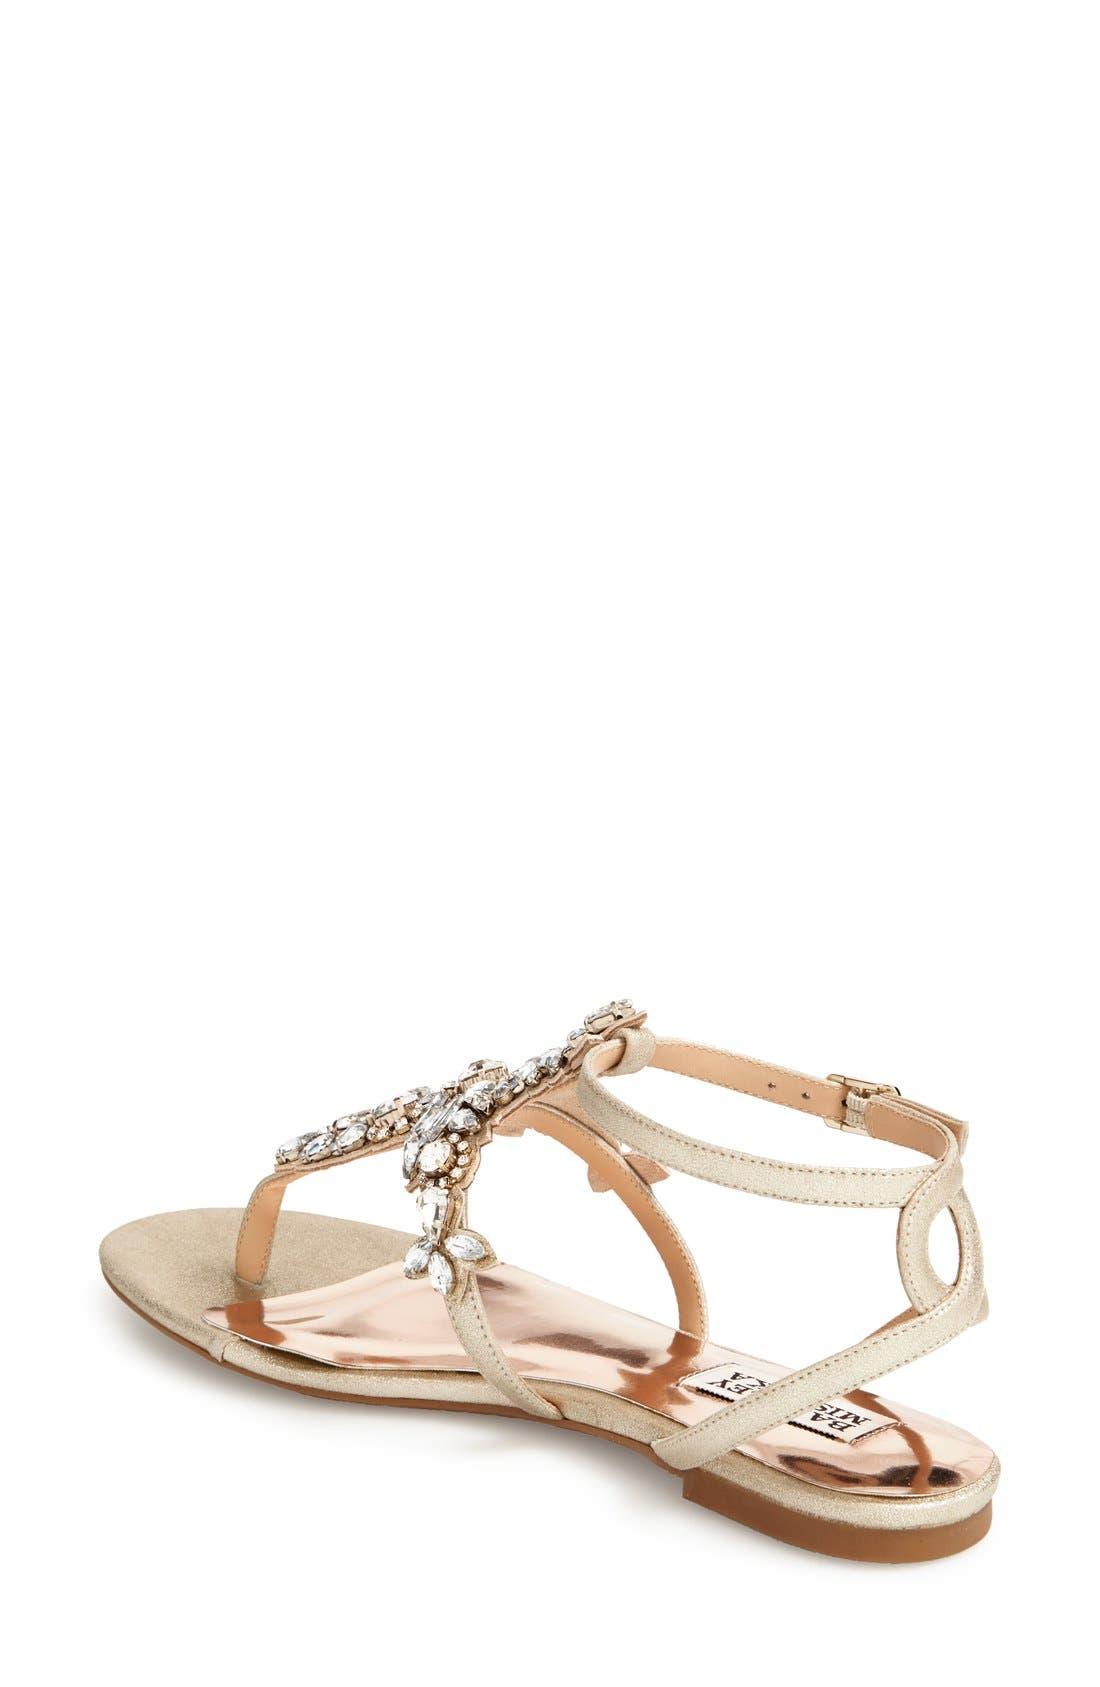 Alternate Image 2  - Badgley Mischka 'Cara' Crystal Embellished Flat Sandal (Women)